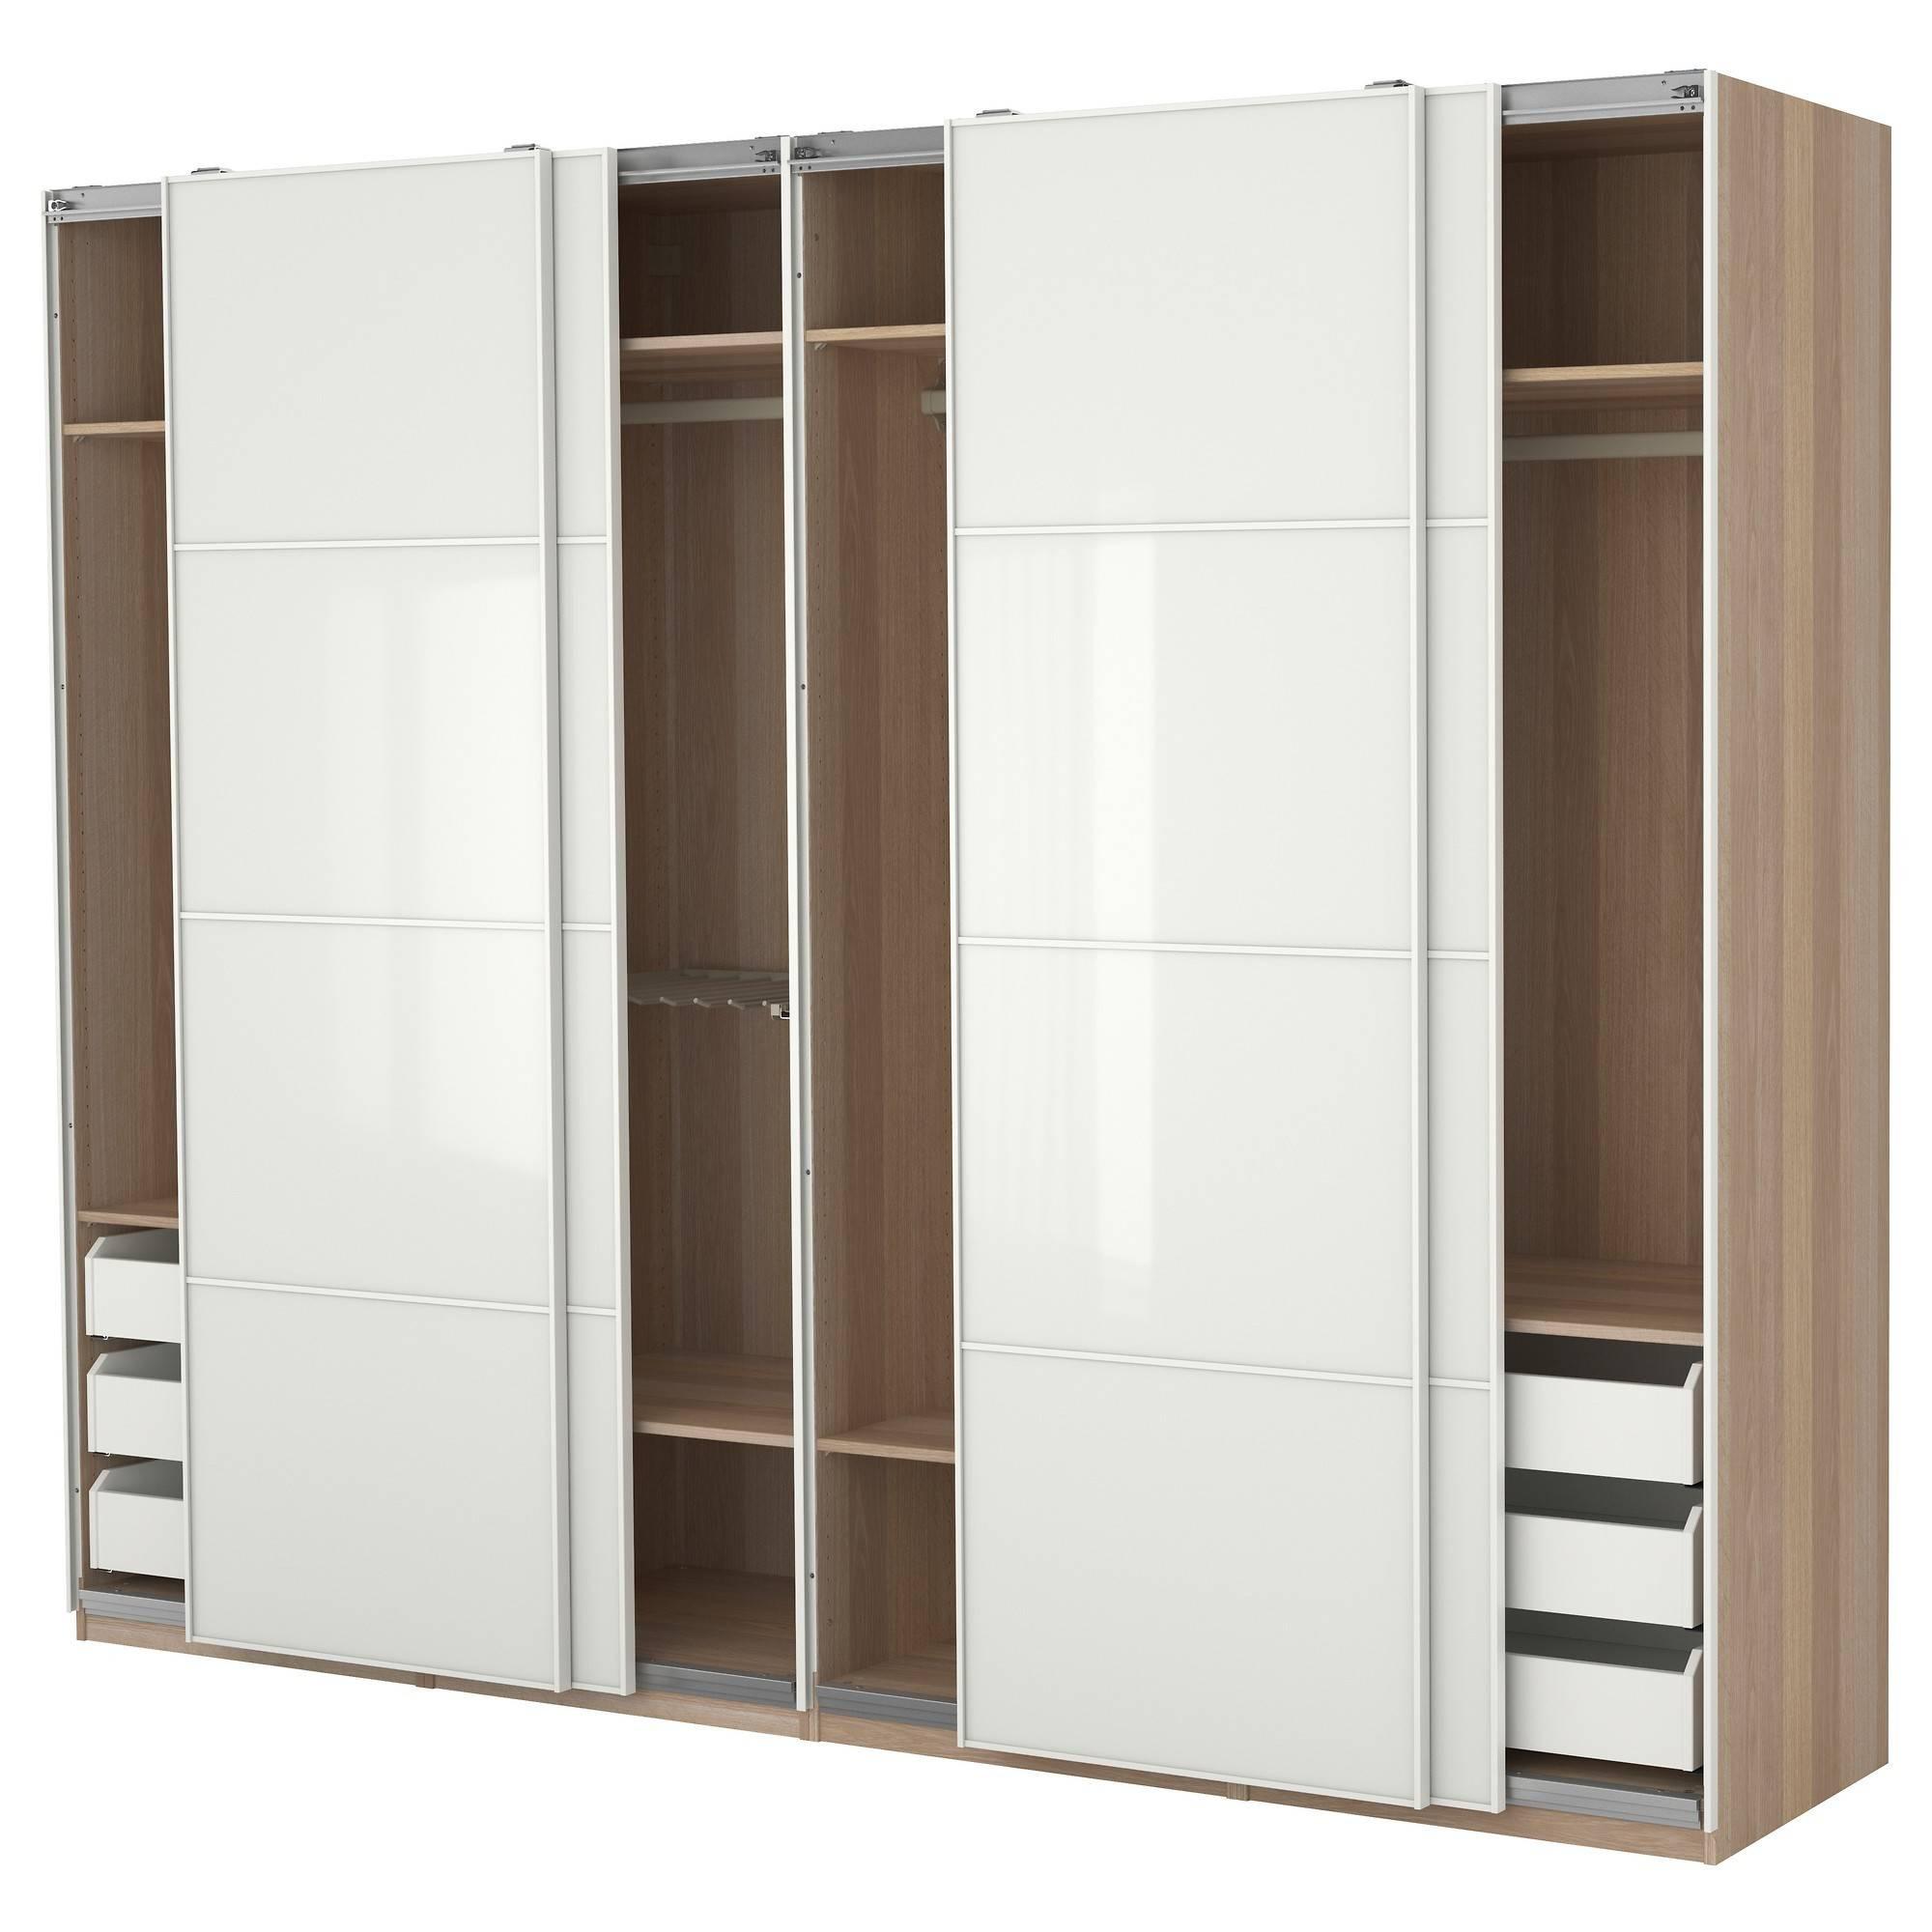 Cheap Closet Doors - Karinnelegault with regard to Cheap 4 Door Wardrobes (Image 3 of 15)